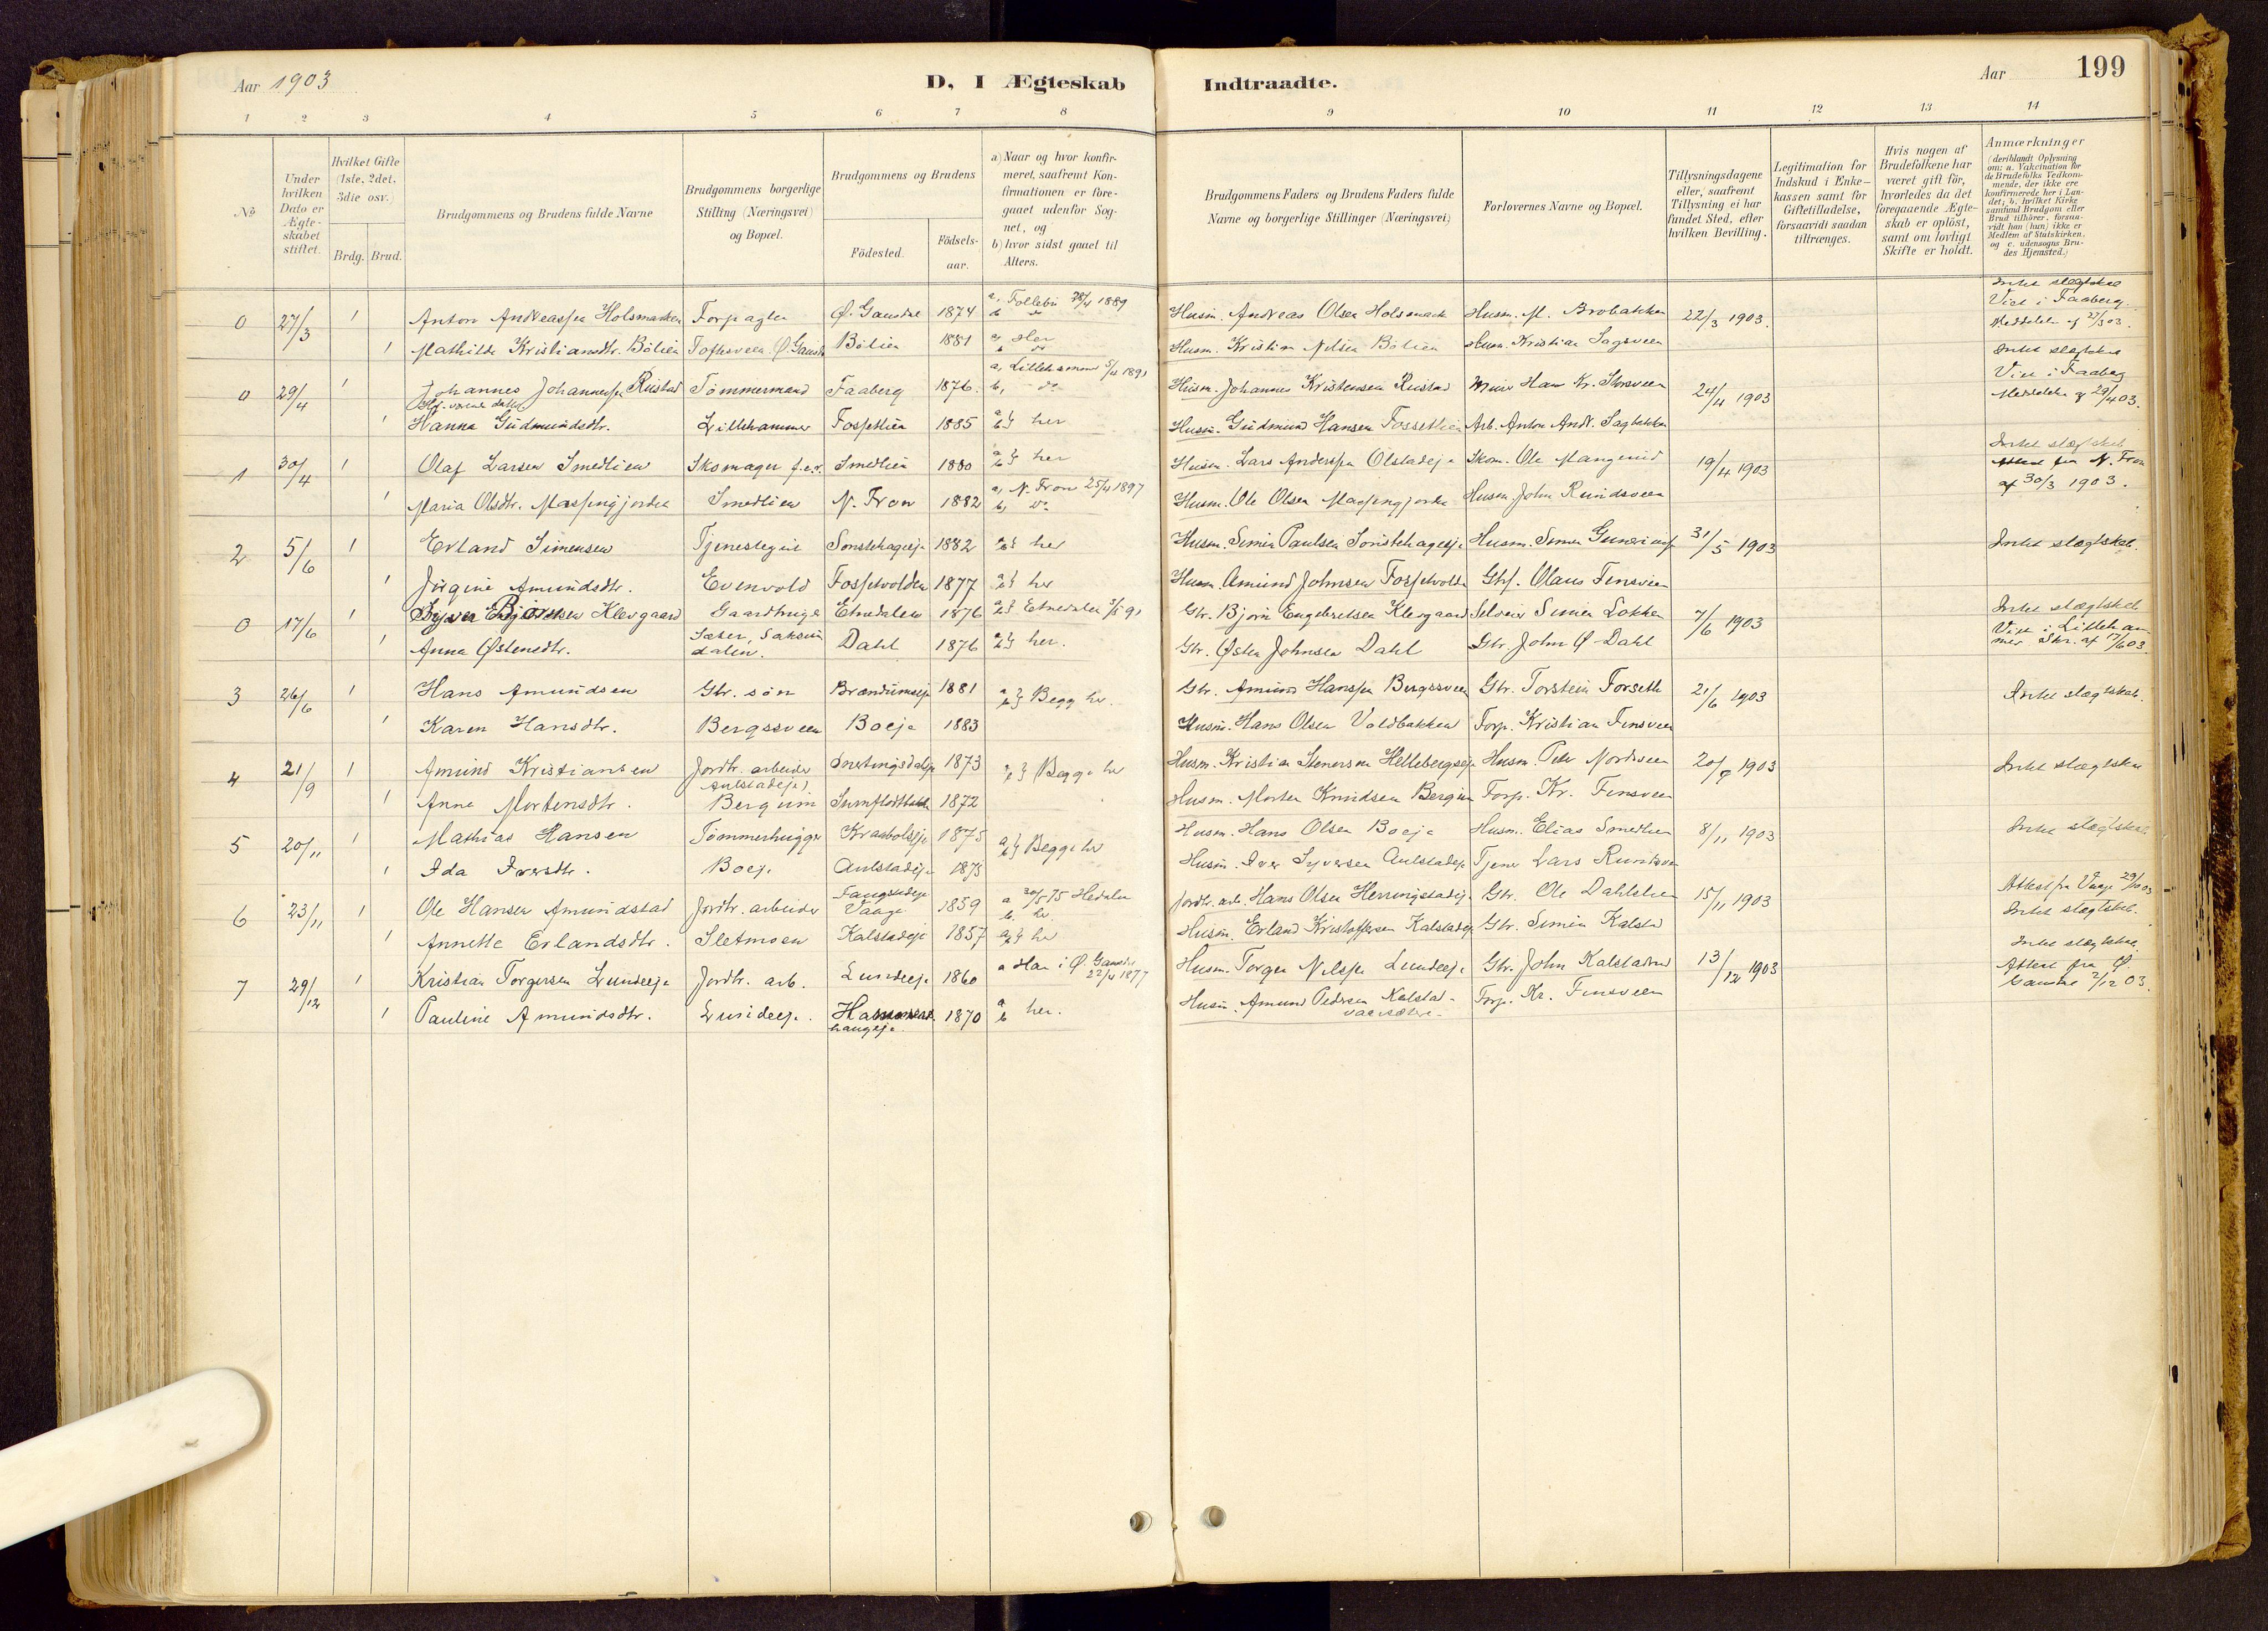 SAH, Vestre Gausdal prestekontor, Ministerialbok nr. 1, 1887-1914, s. 199